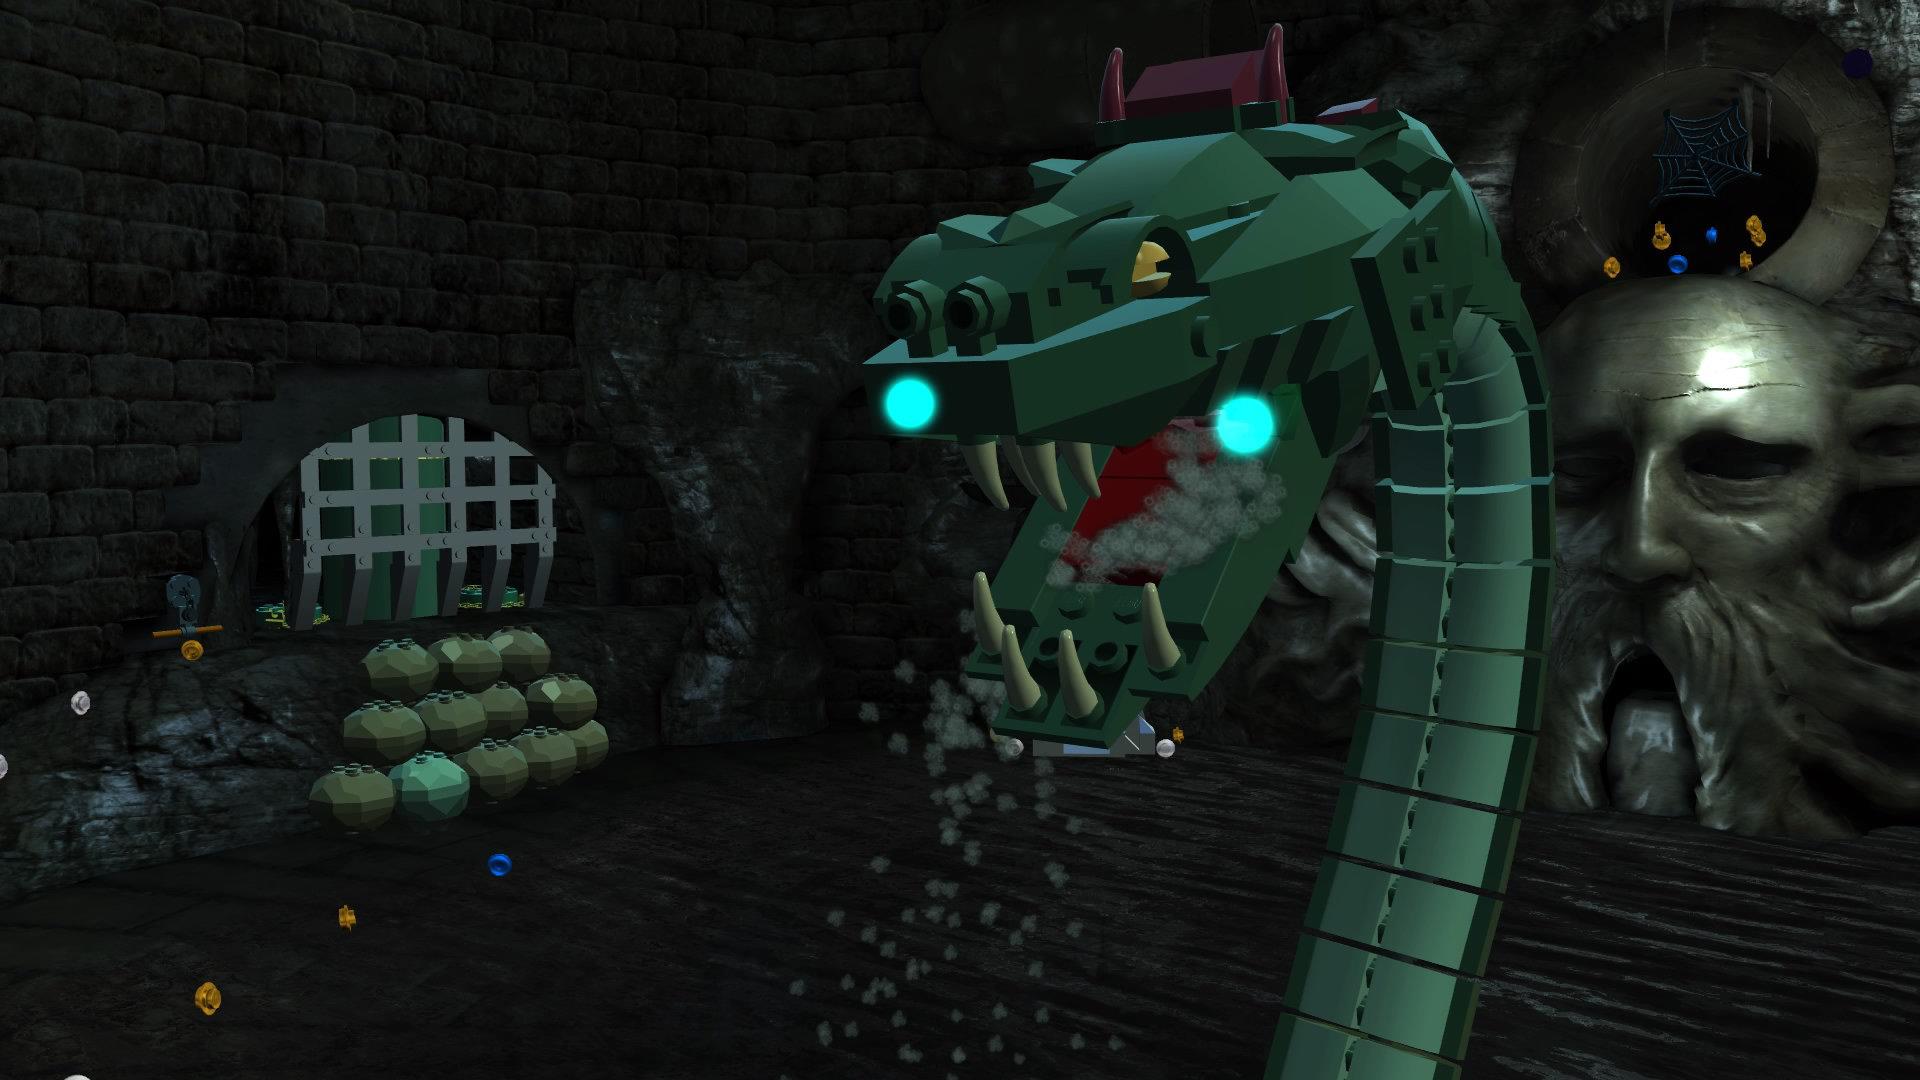 harry potter and half blood prince game download torrent